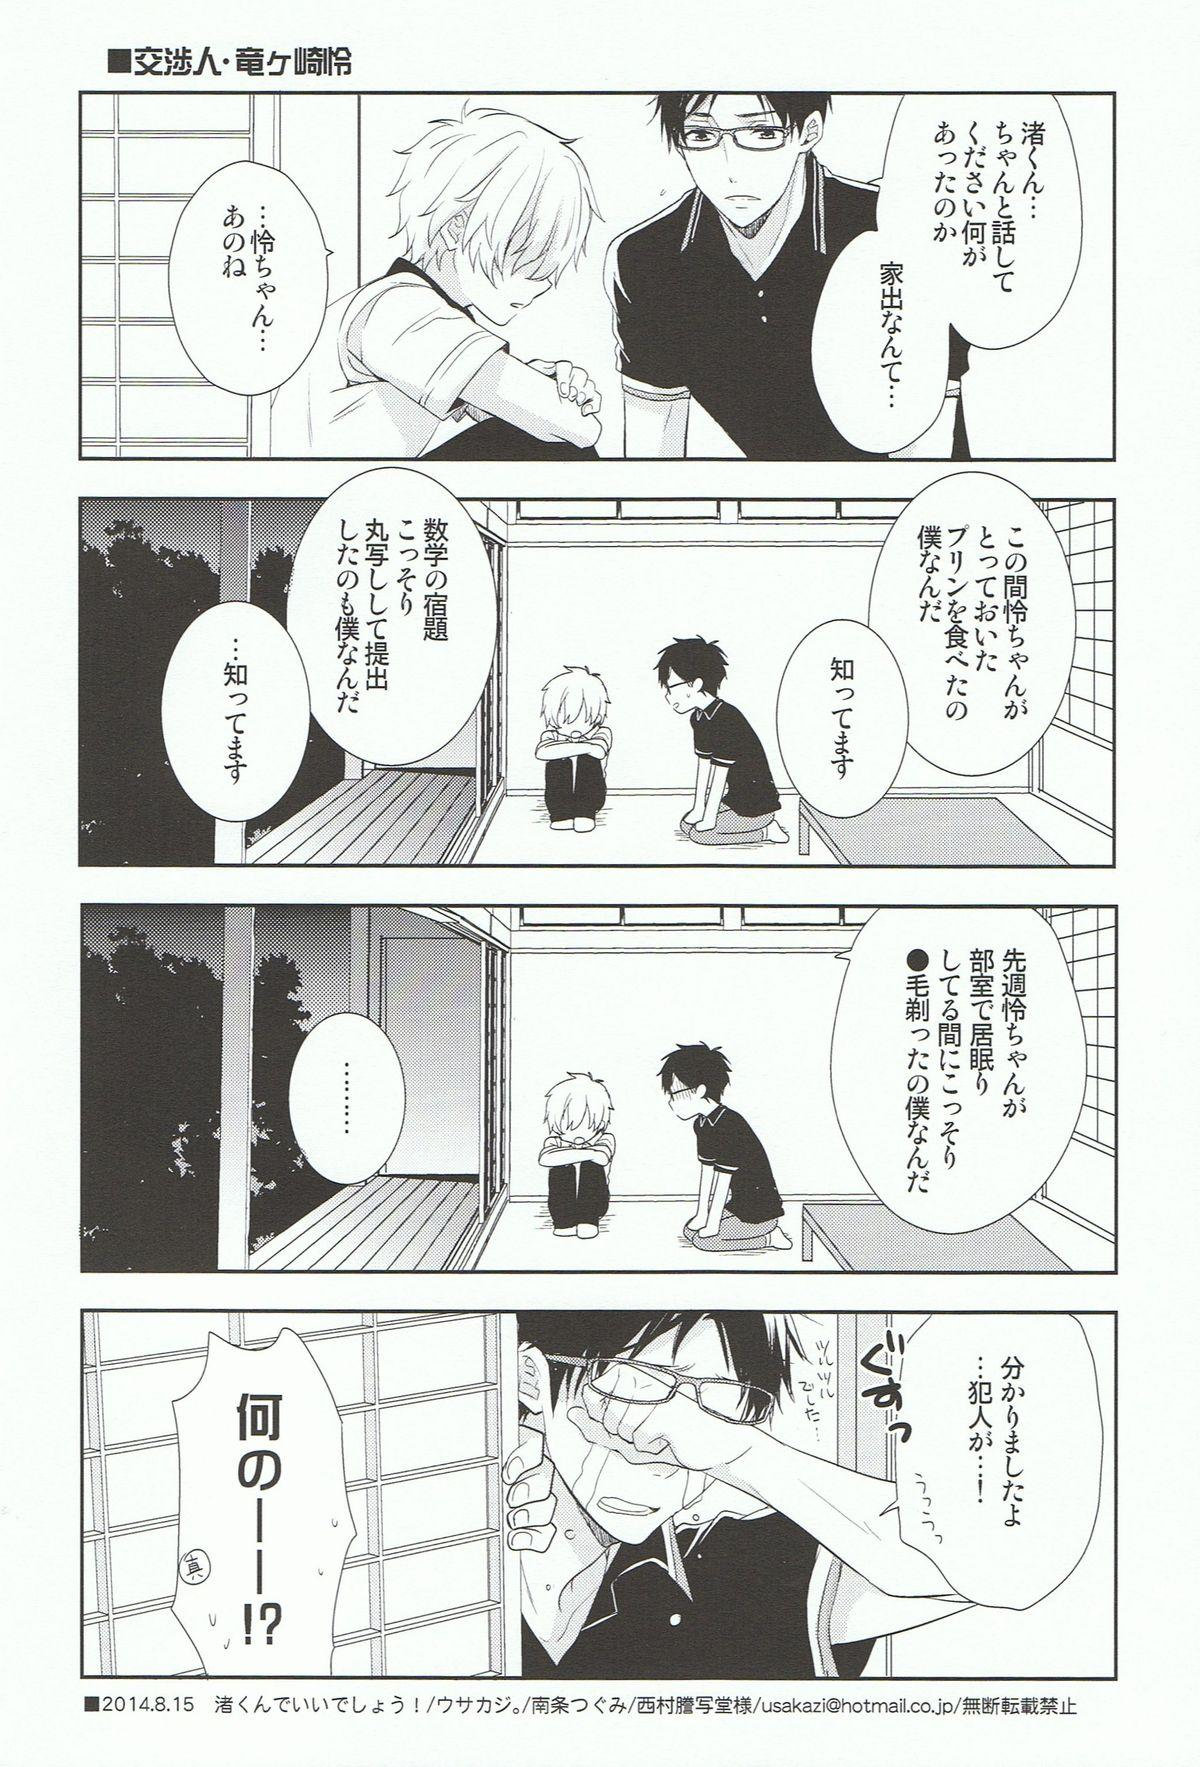 Nagisa-kun de ii deshou! 20